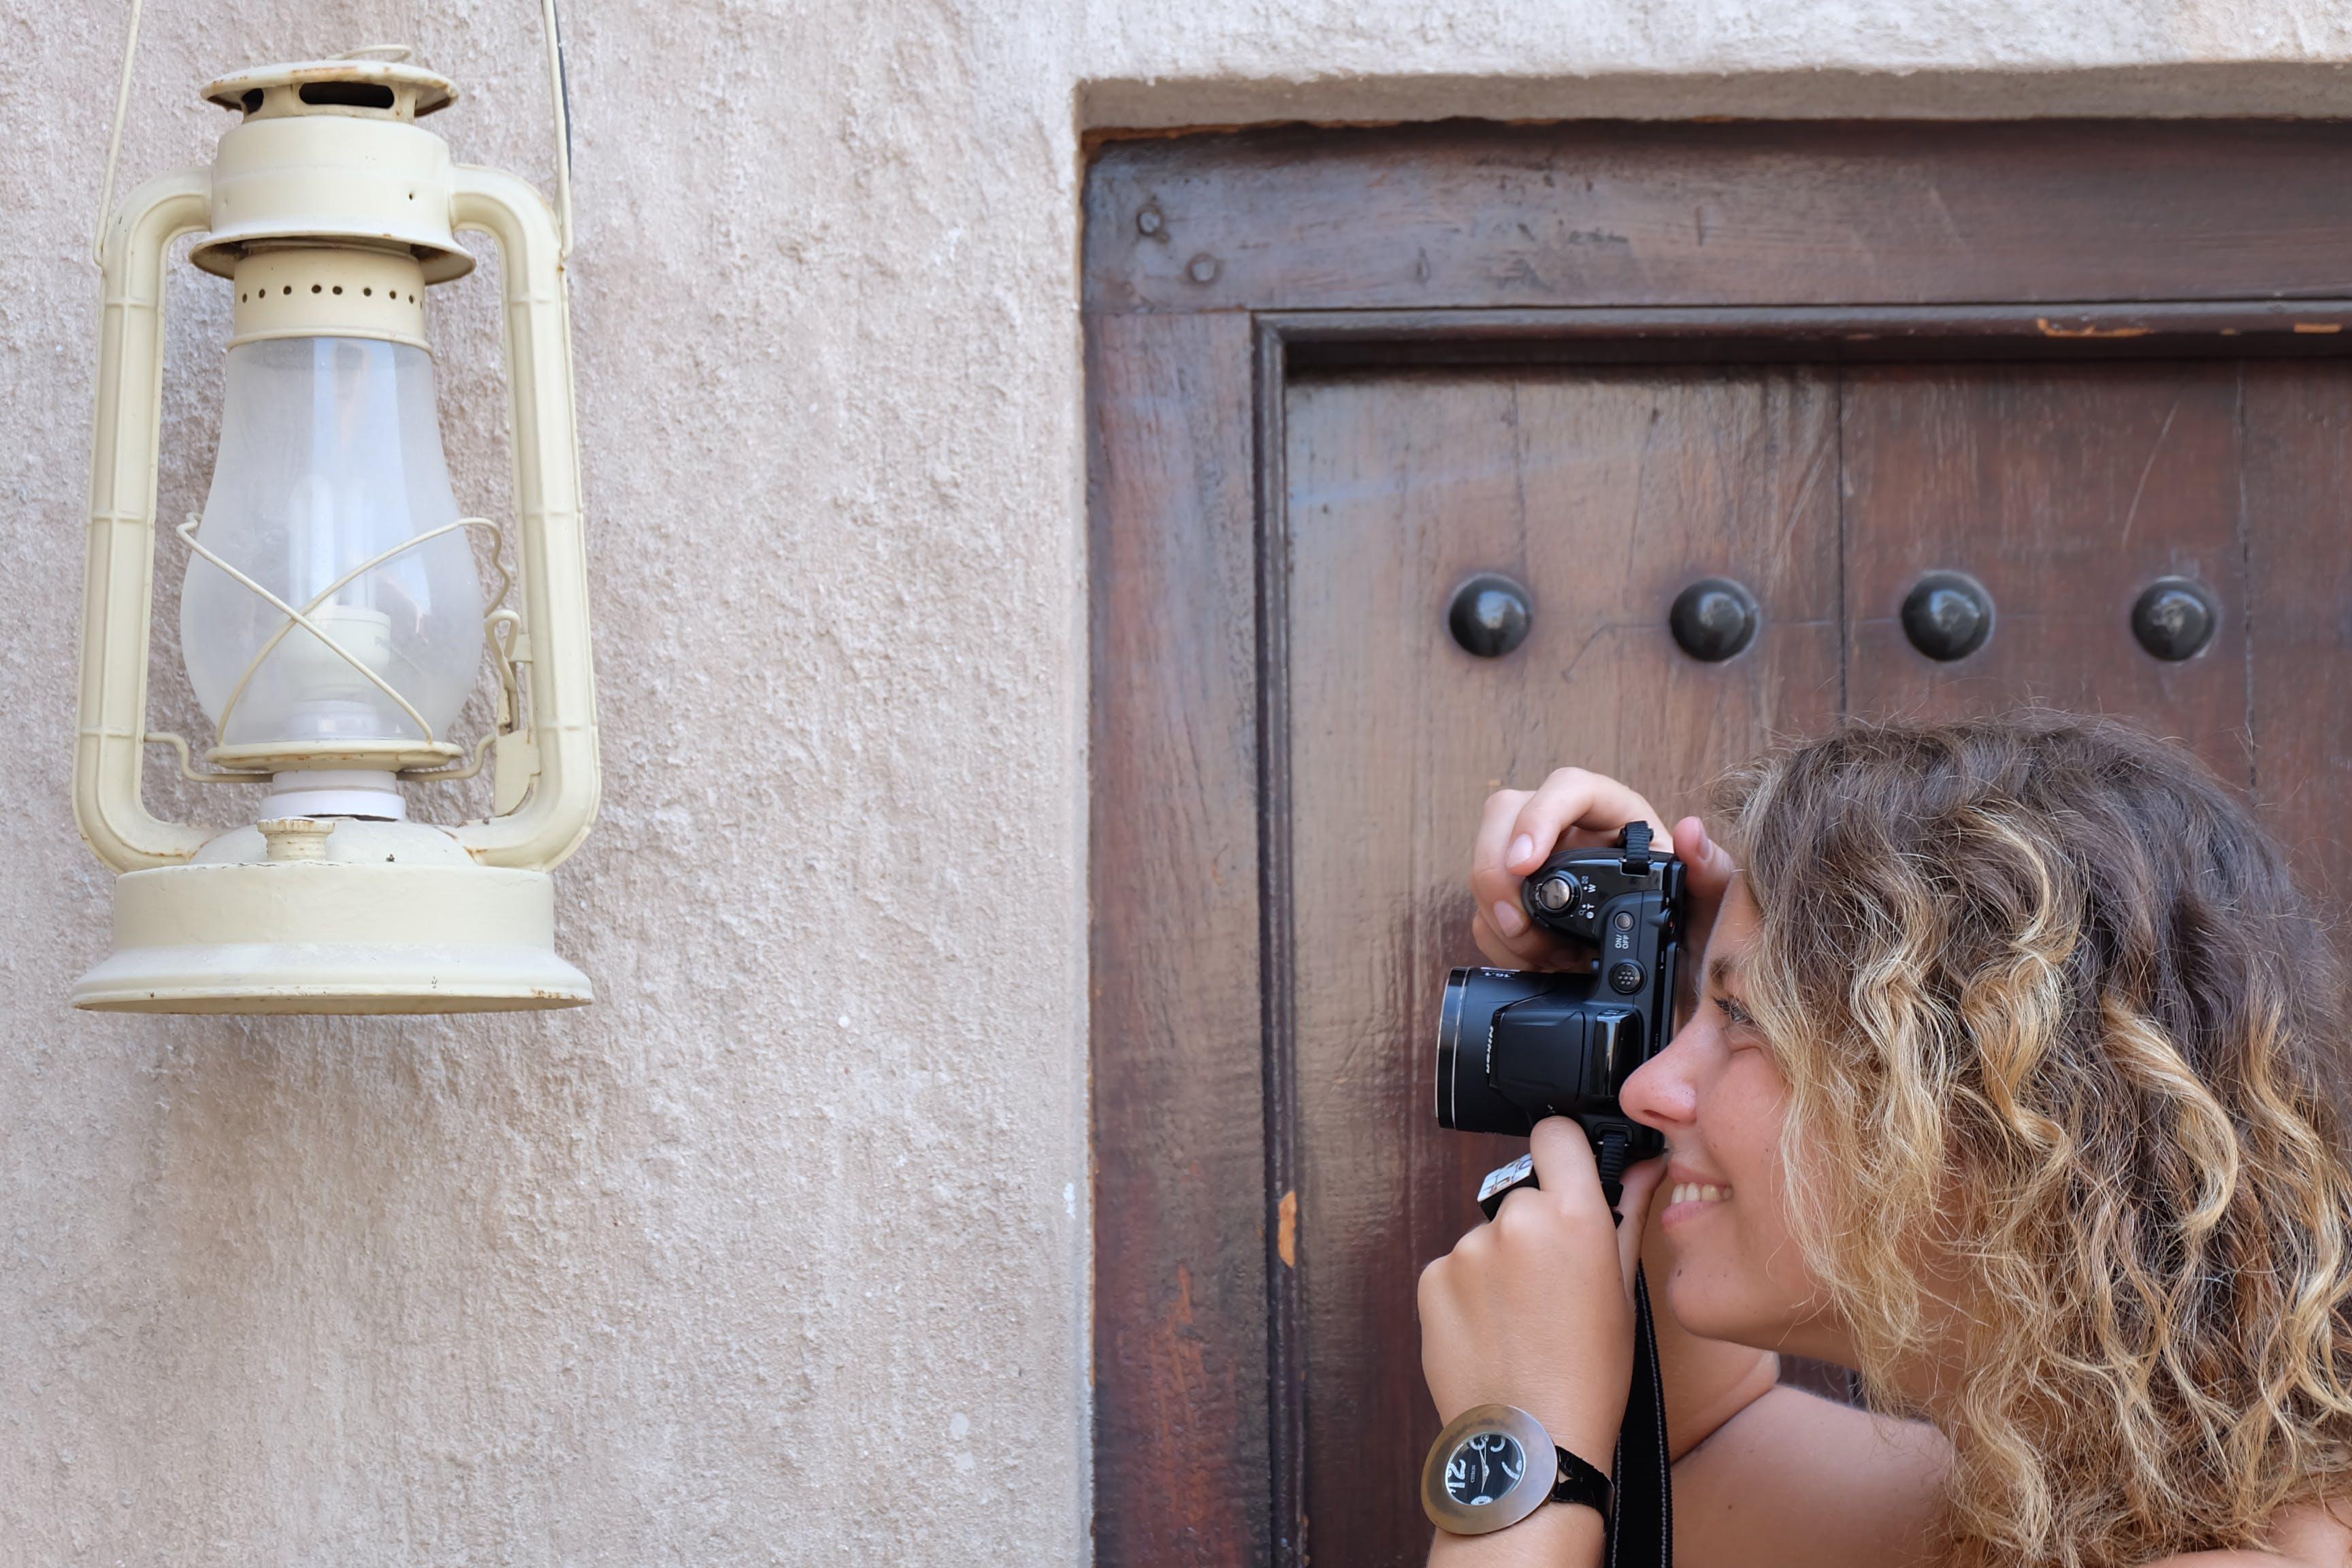 Free stock photo of camera, ceiling lamp, high speed photography, PhotoWalk